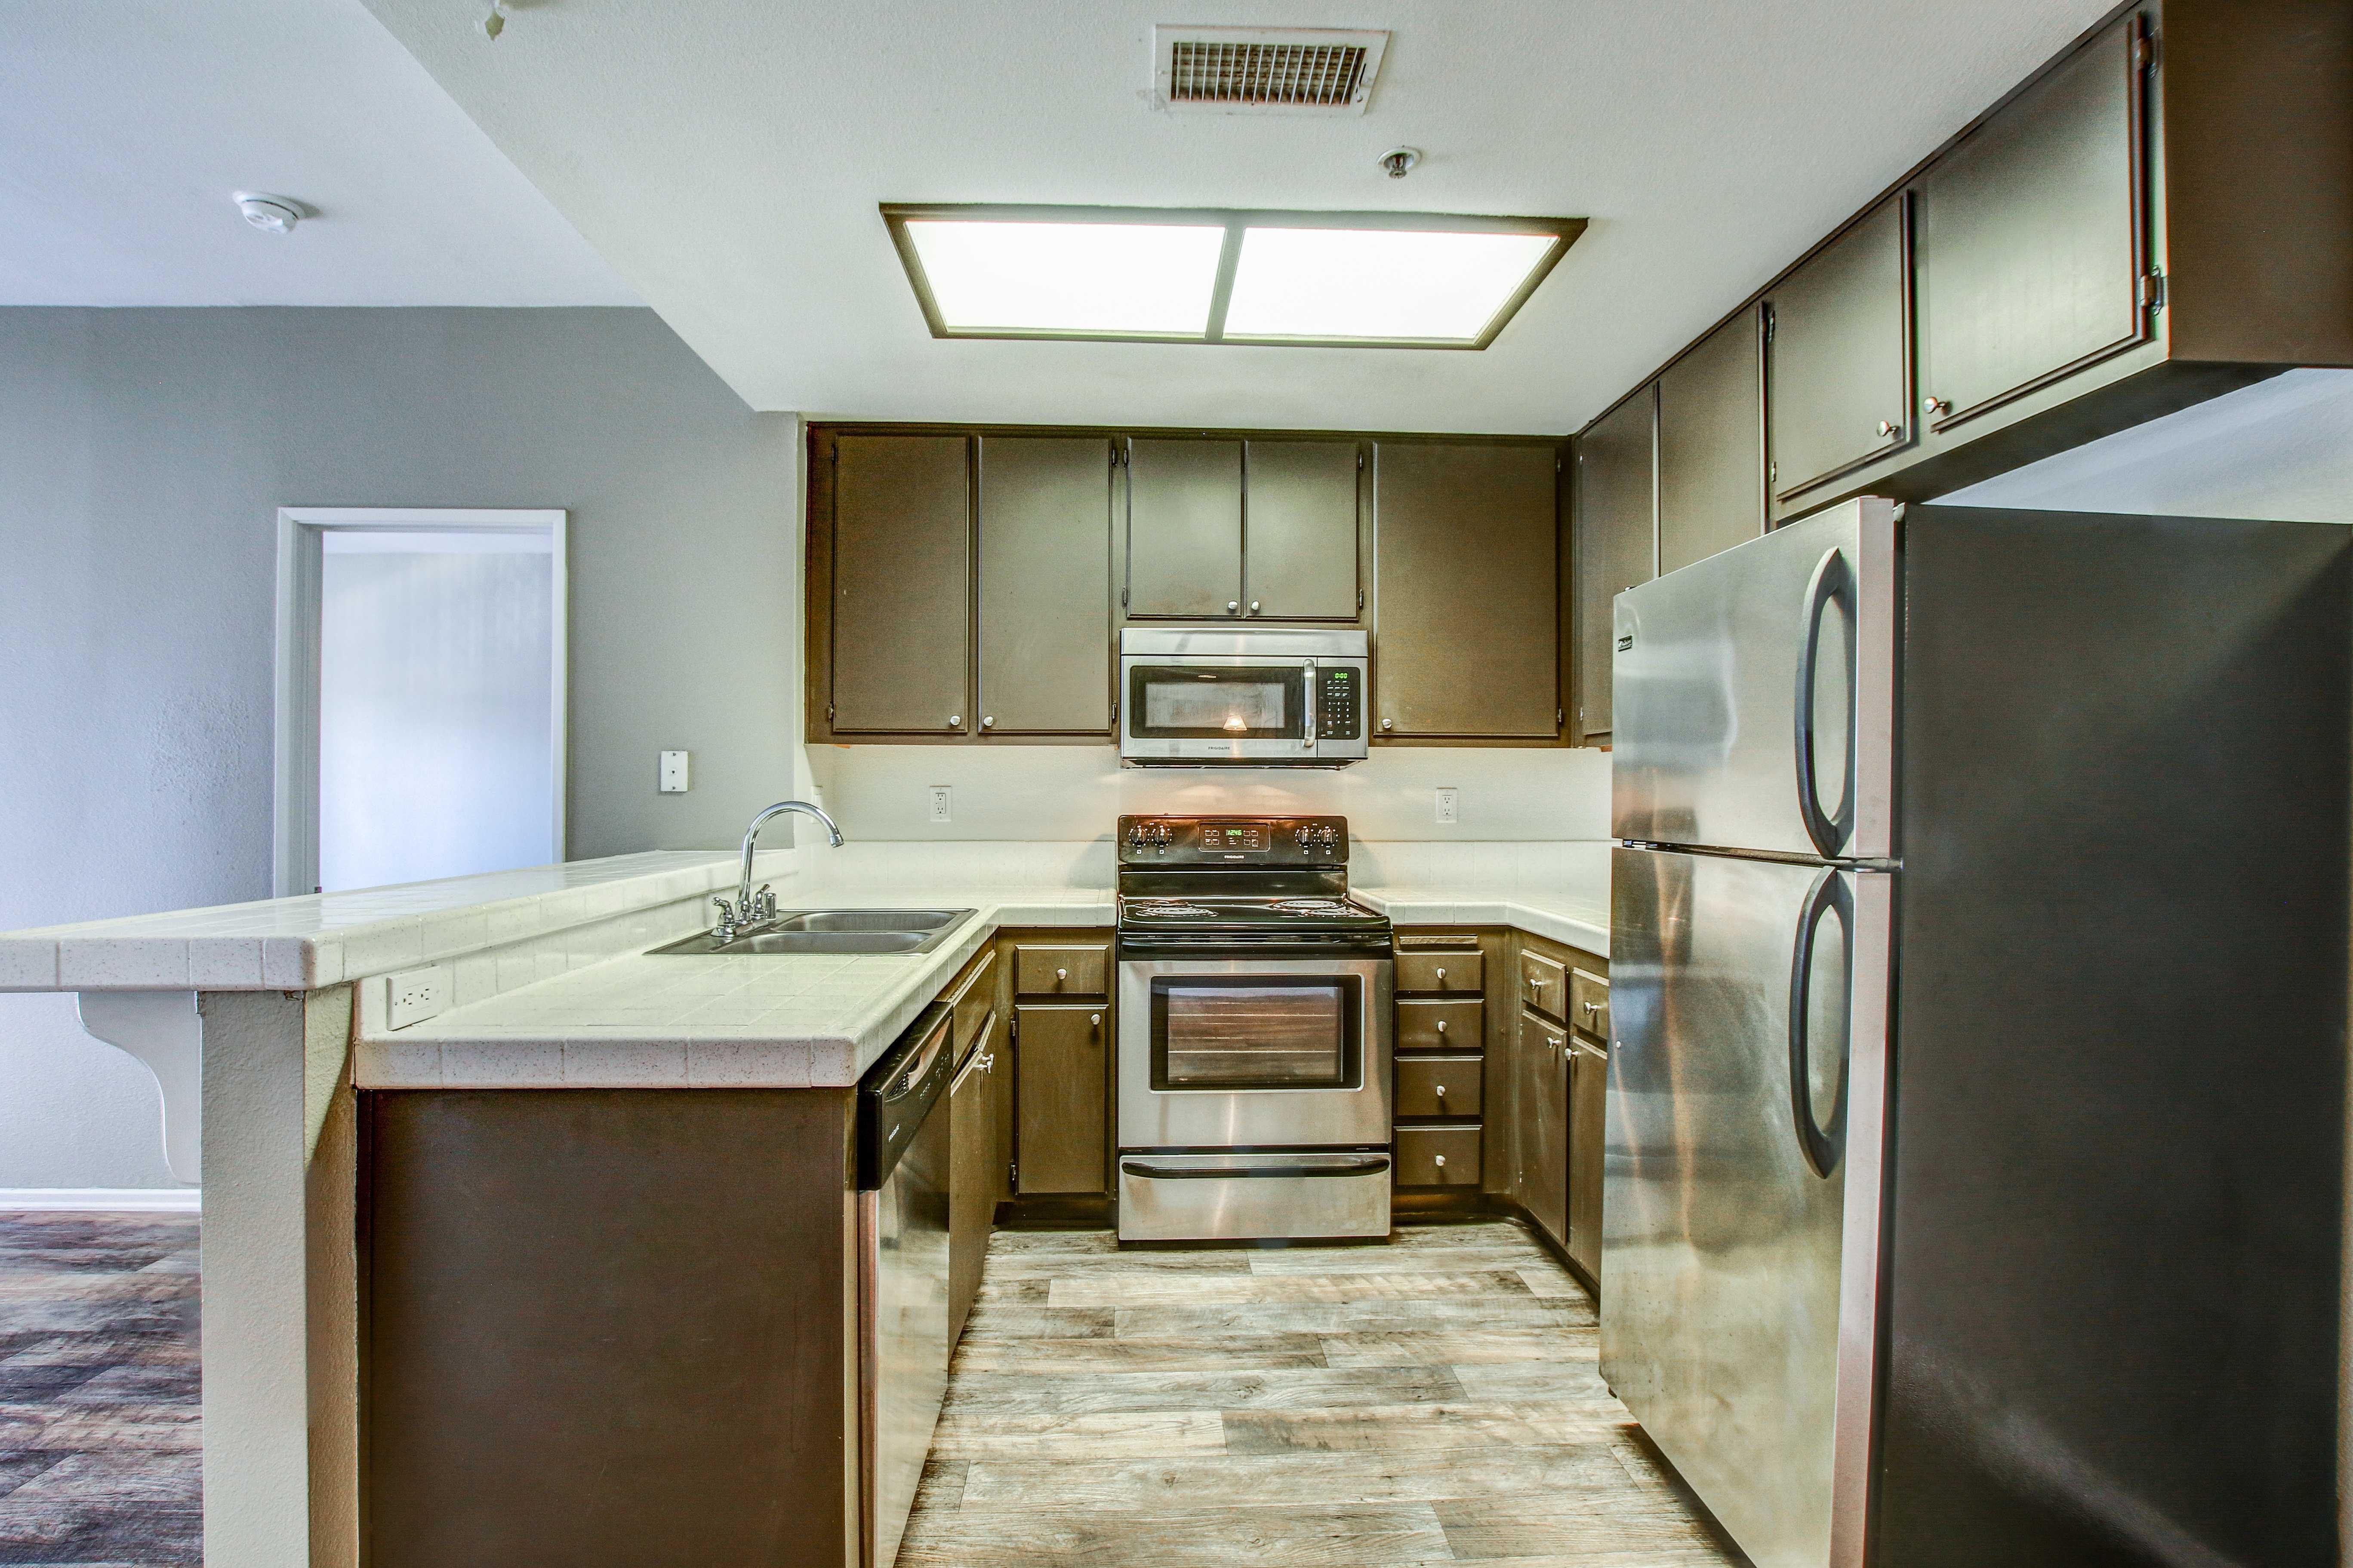 Modern kitchen at apartments in San Diego, California